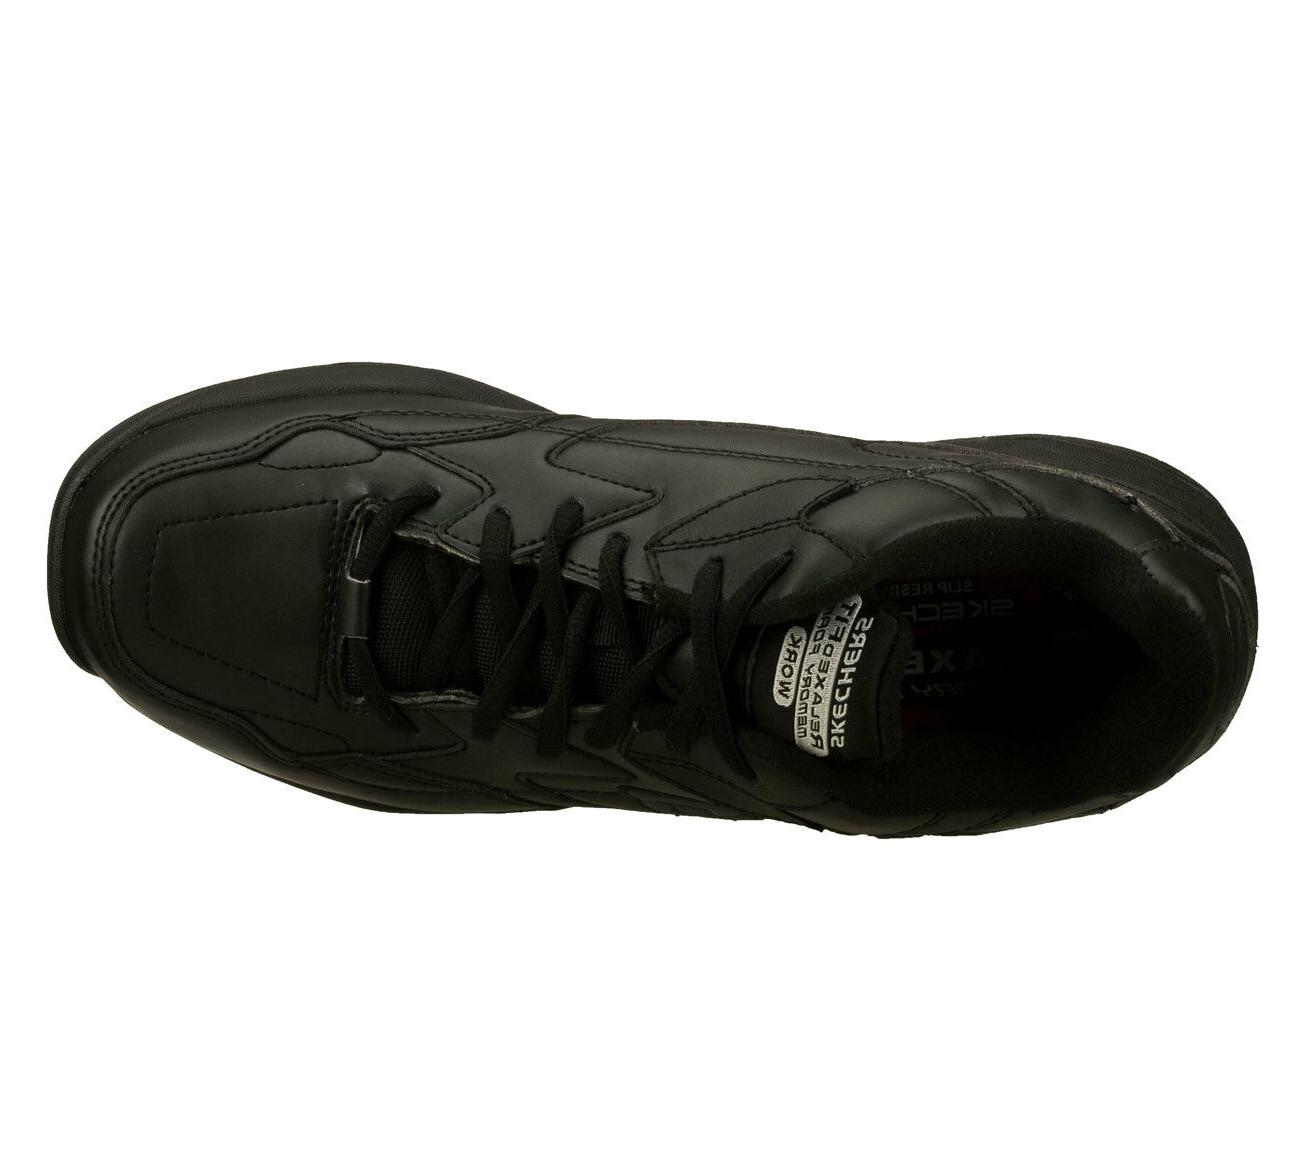 Skechers Foam Men's Casual Slip Resistant